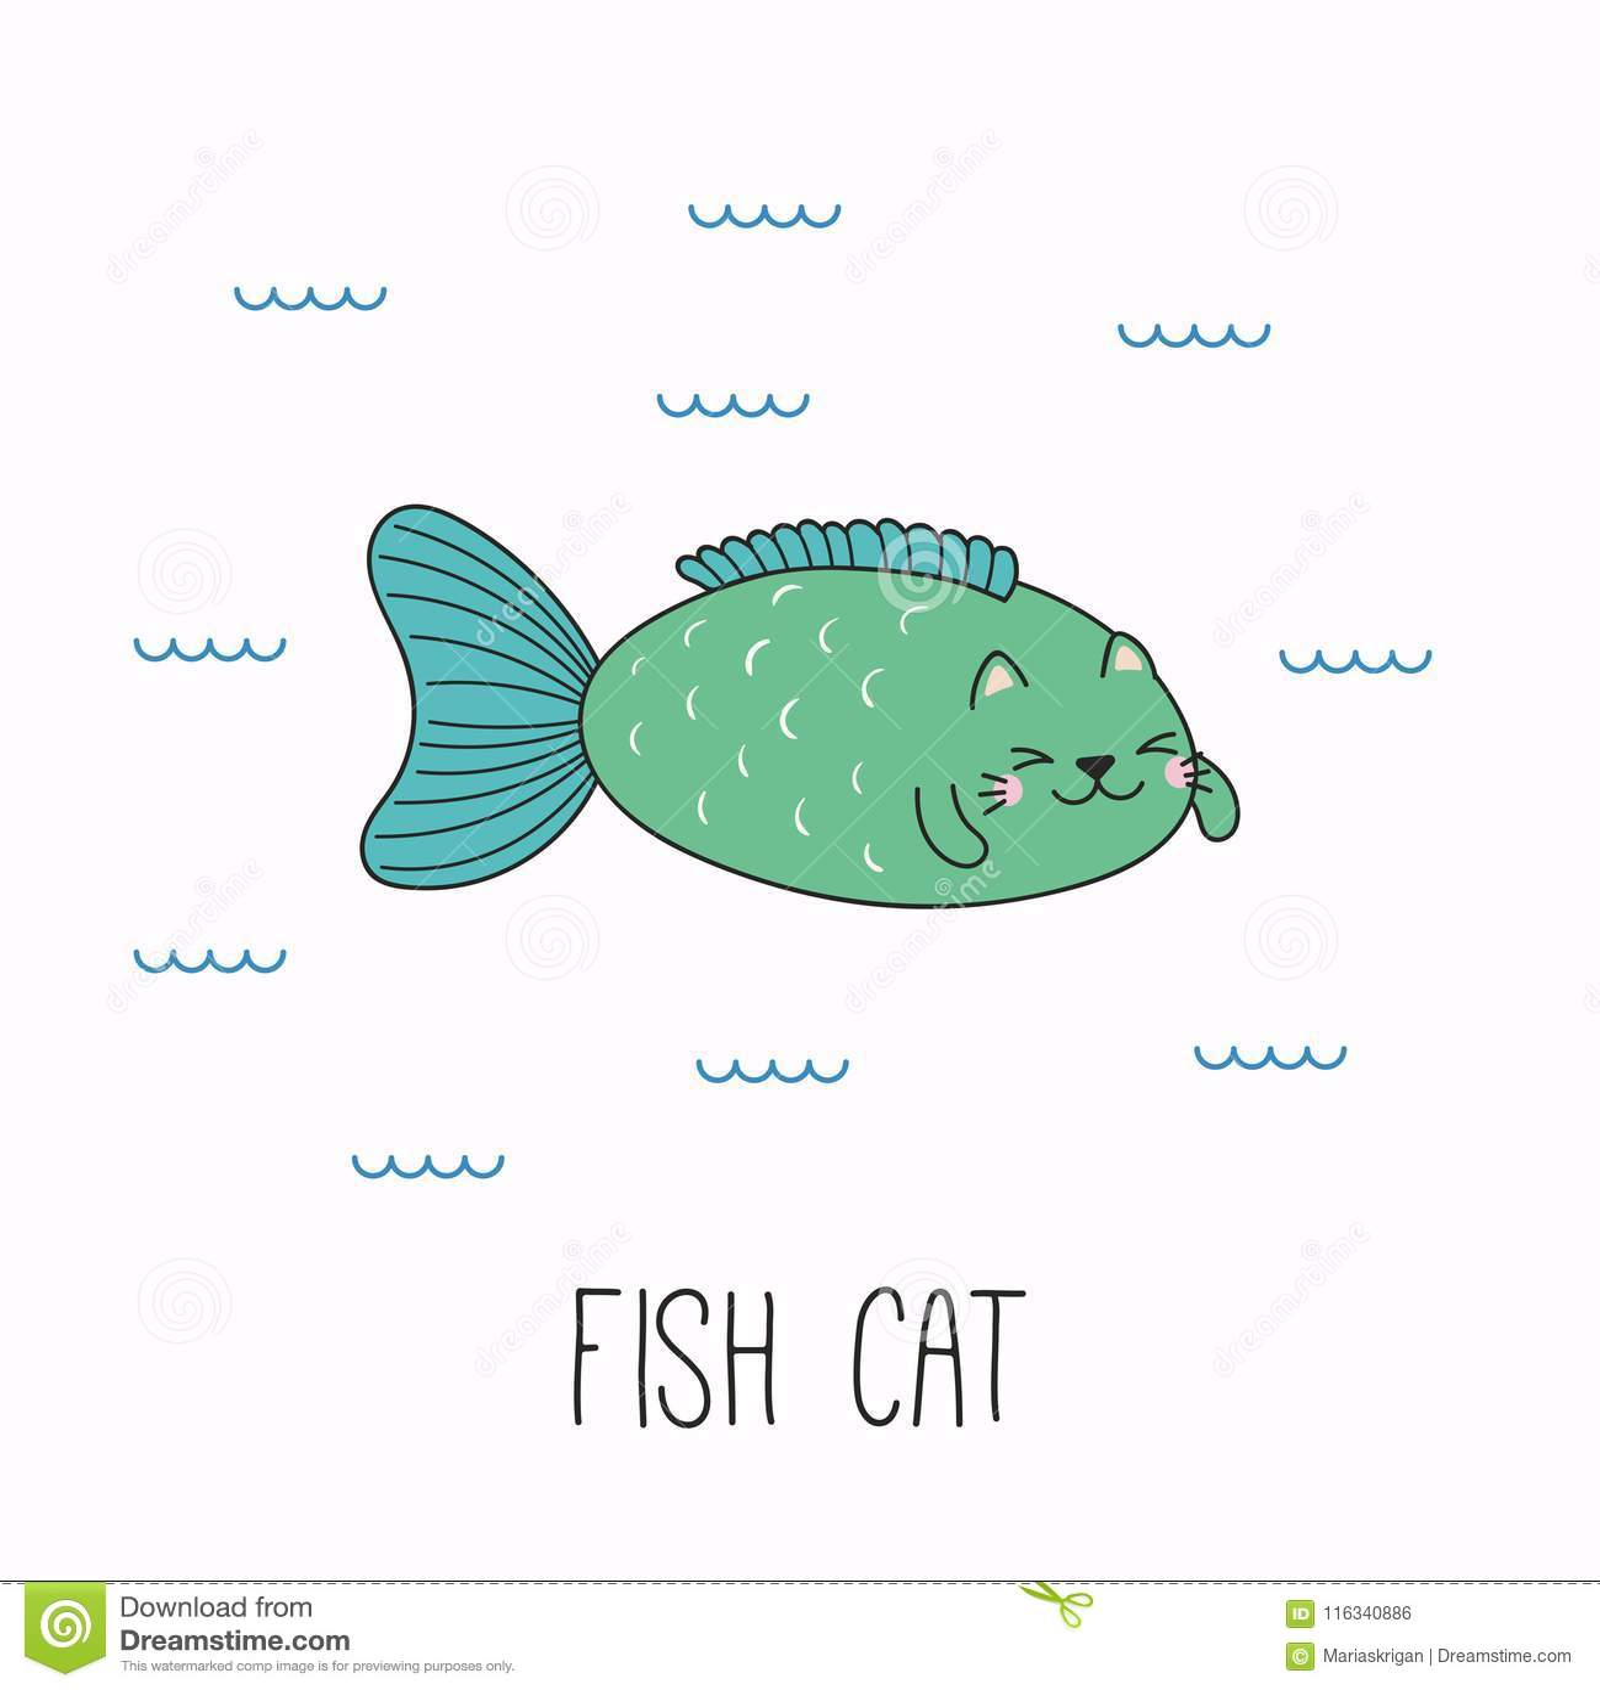 Cute cat fish stock vector. Illustration of clip, book - 116340886